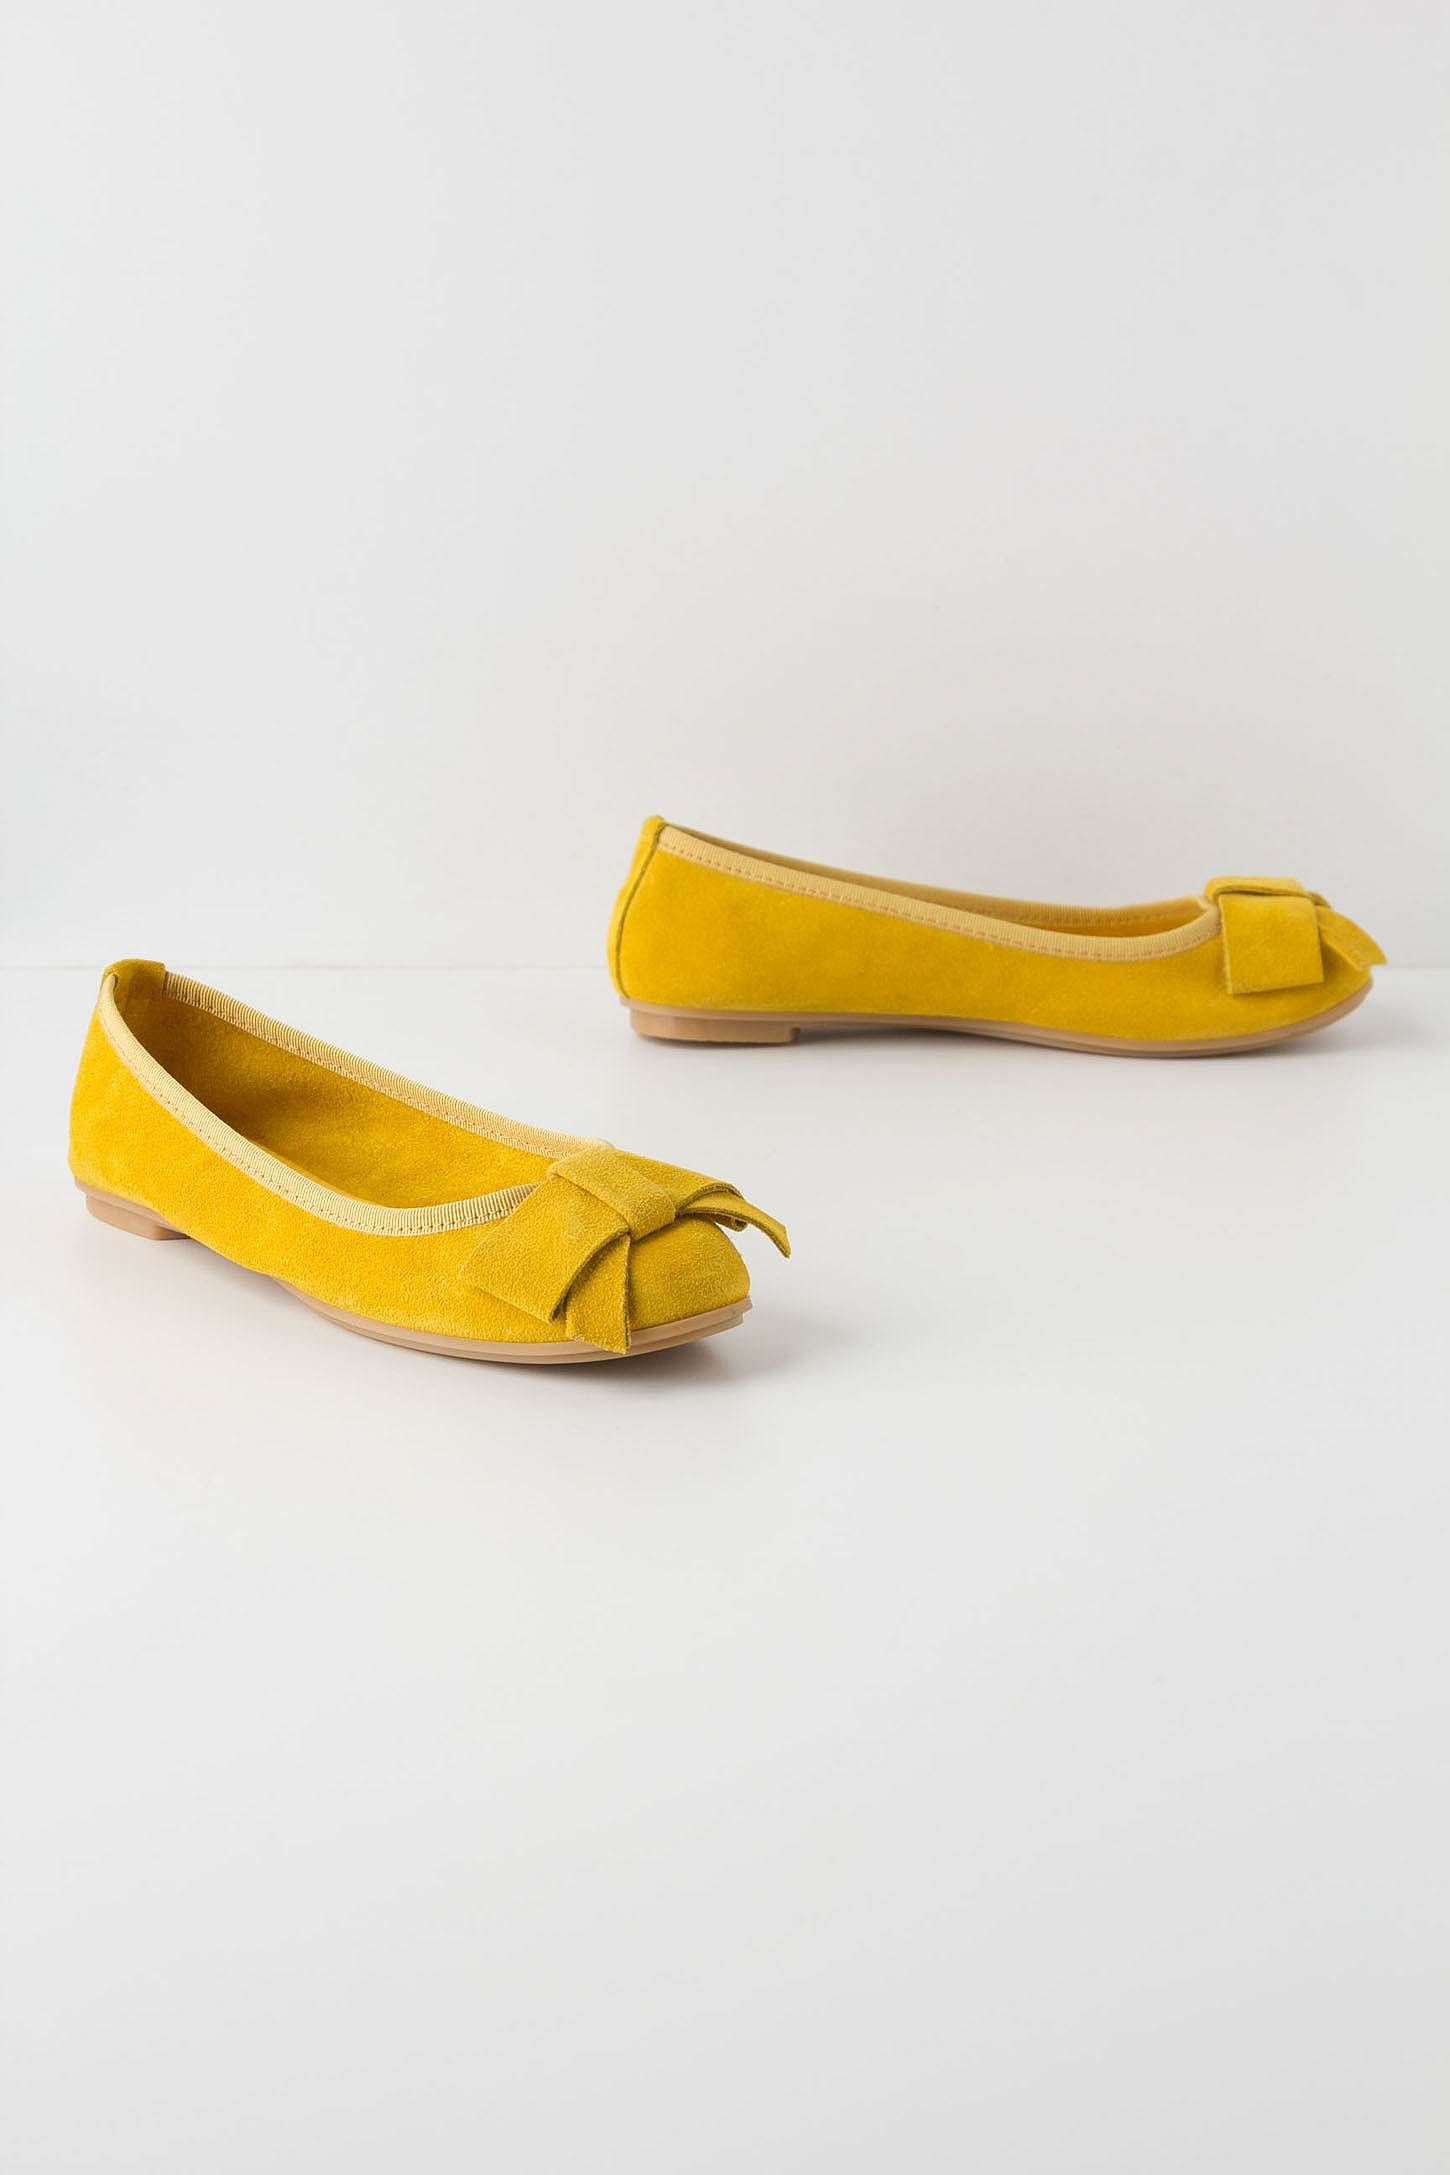 mustard yellow flats